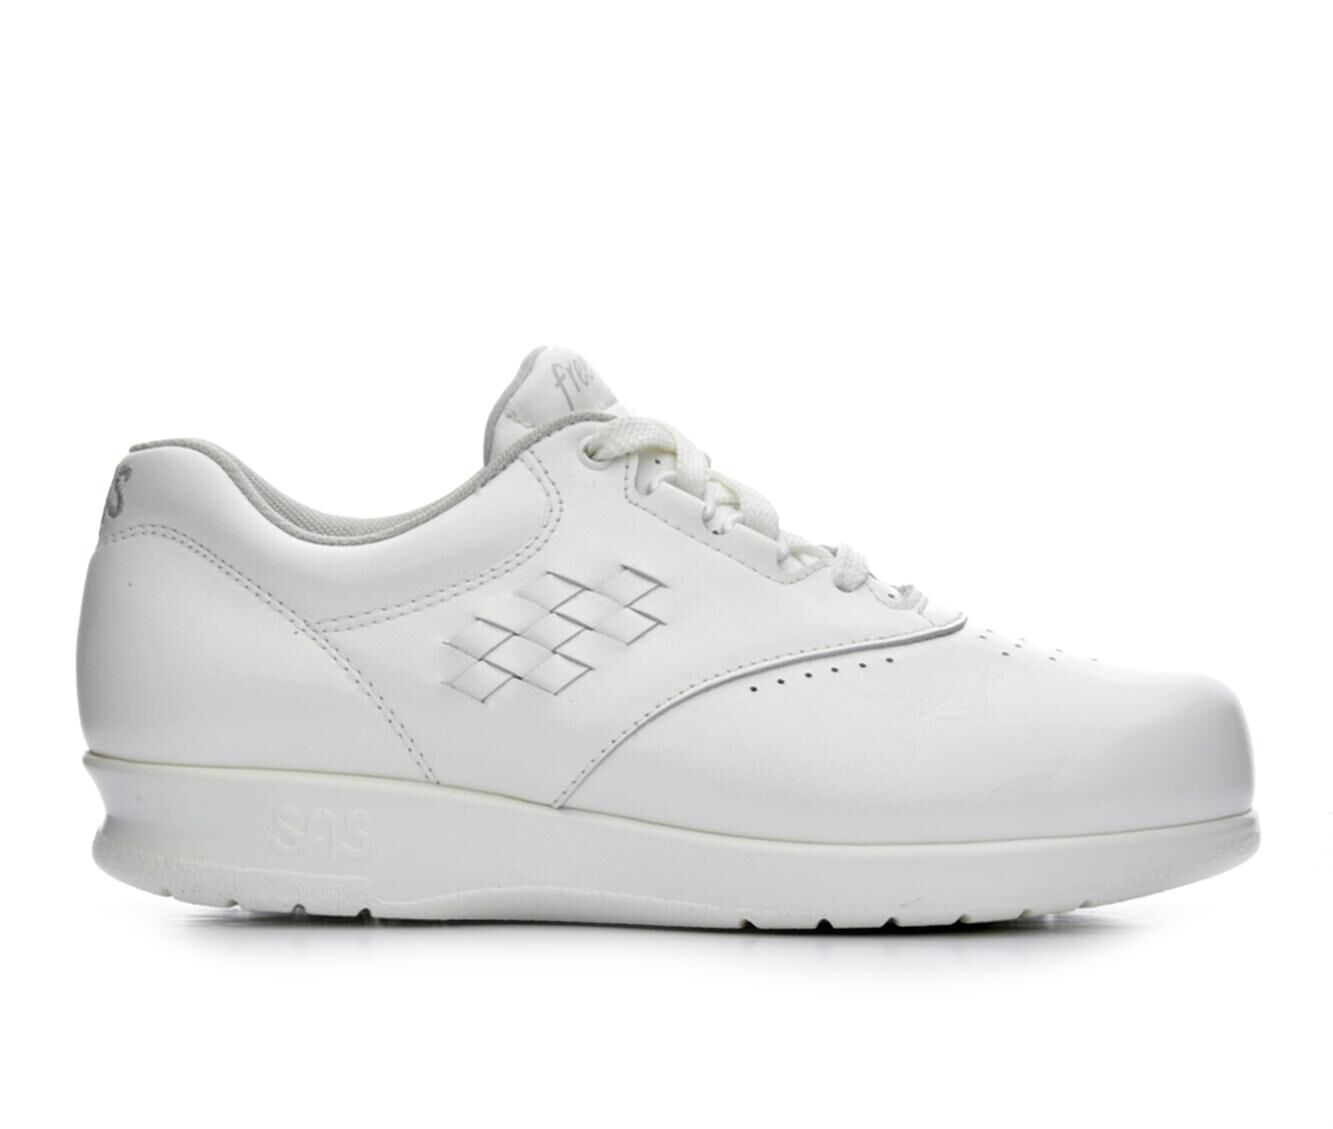 Women's Sas Freetime Comfort W Walking Shoes White